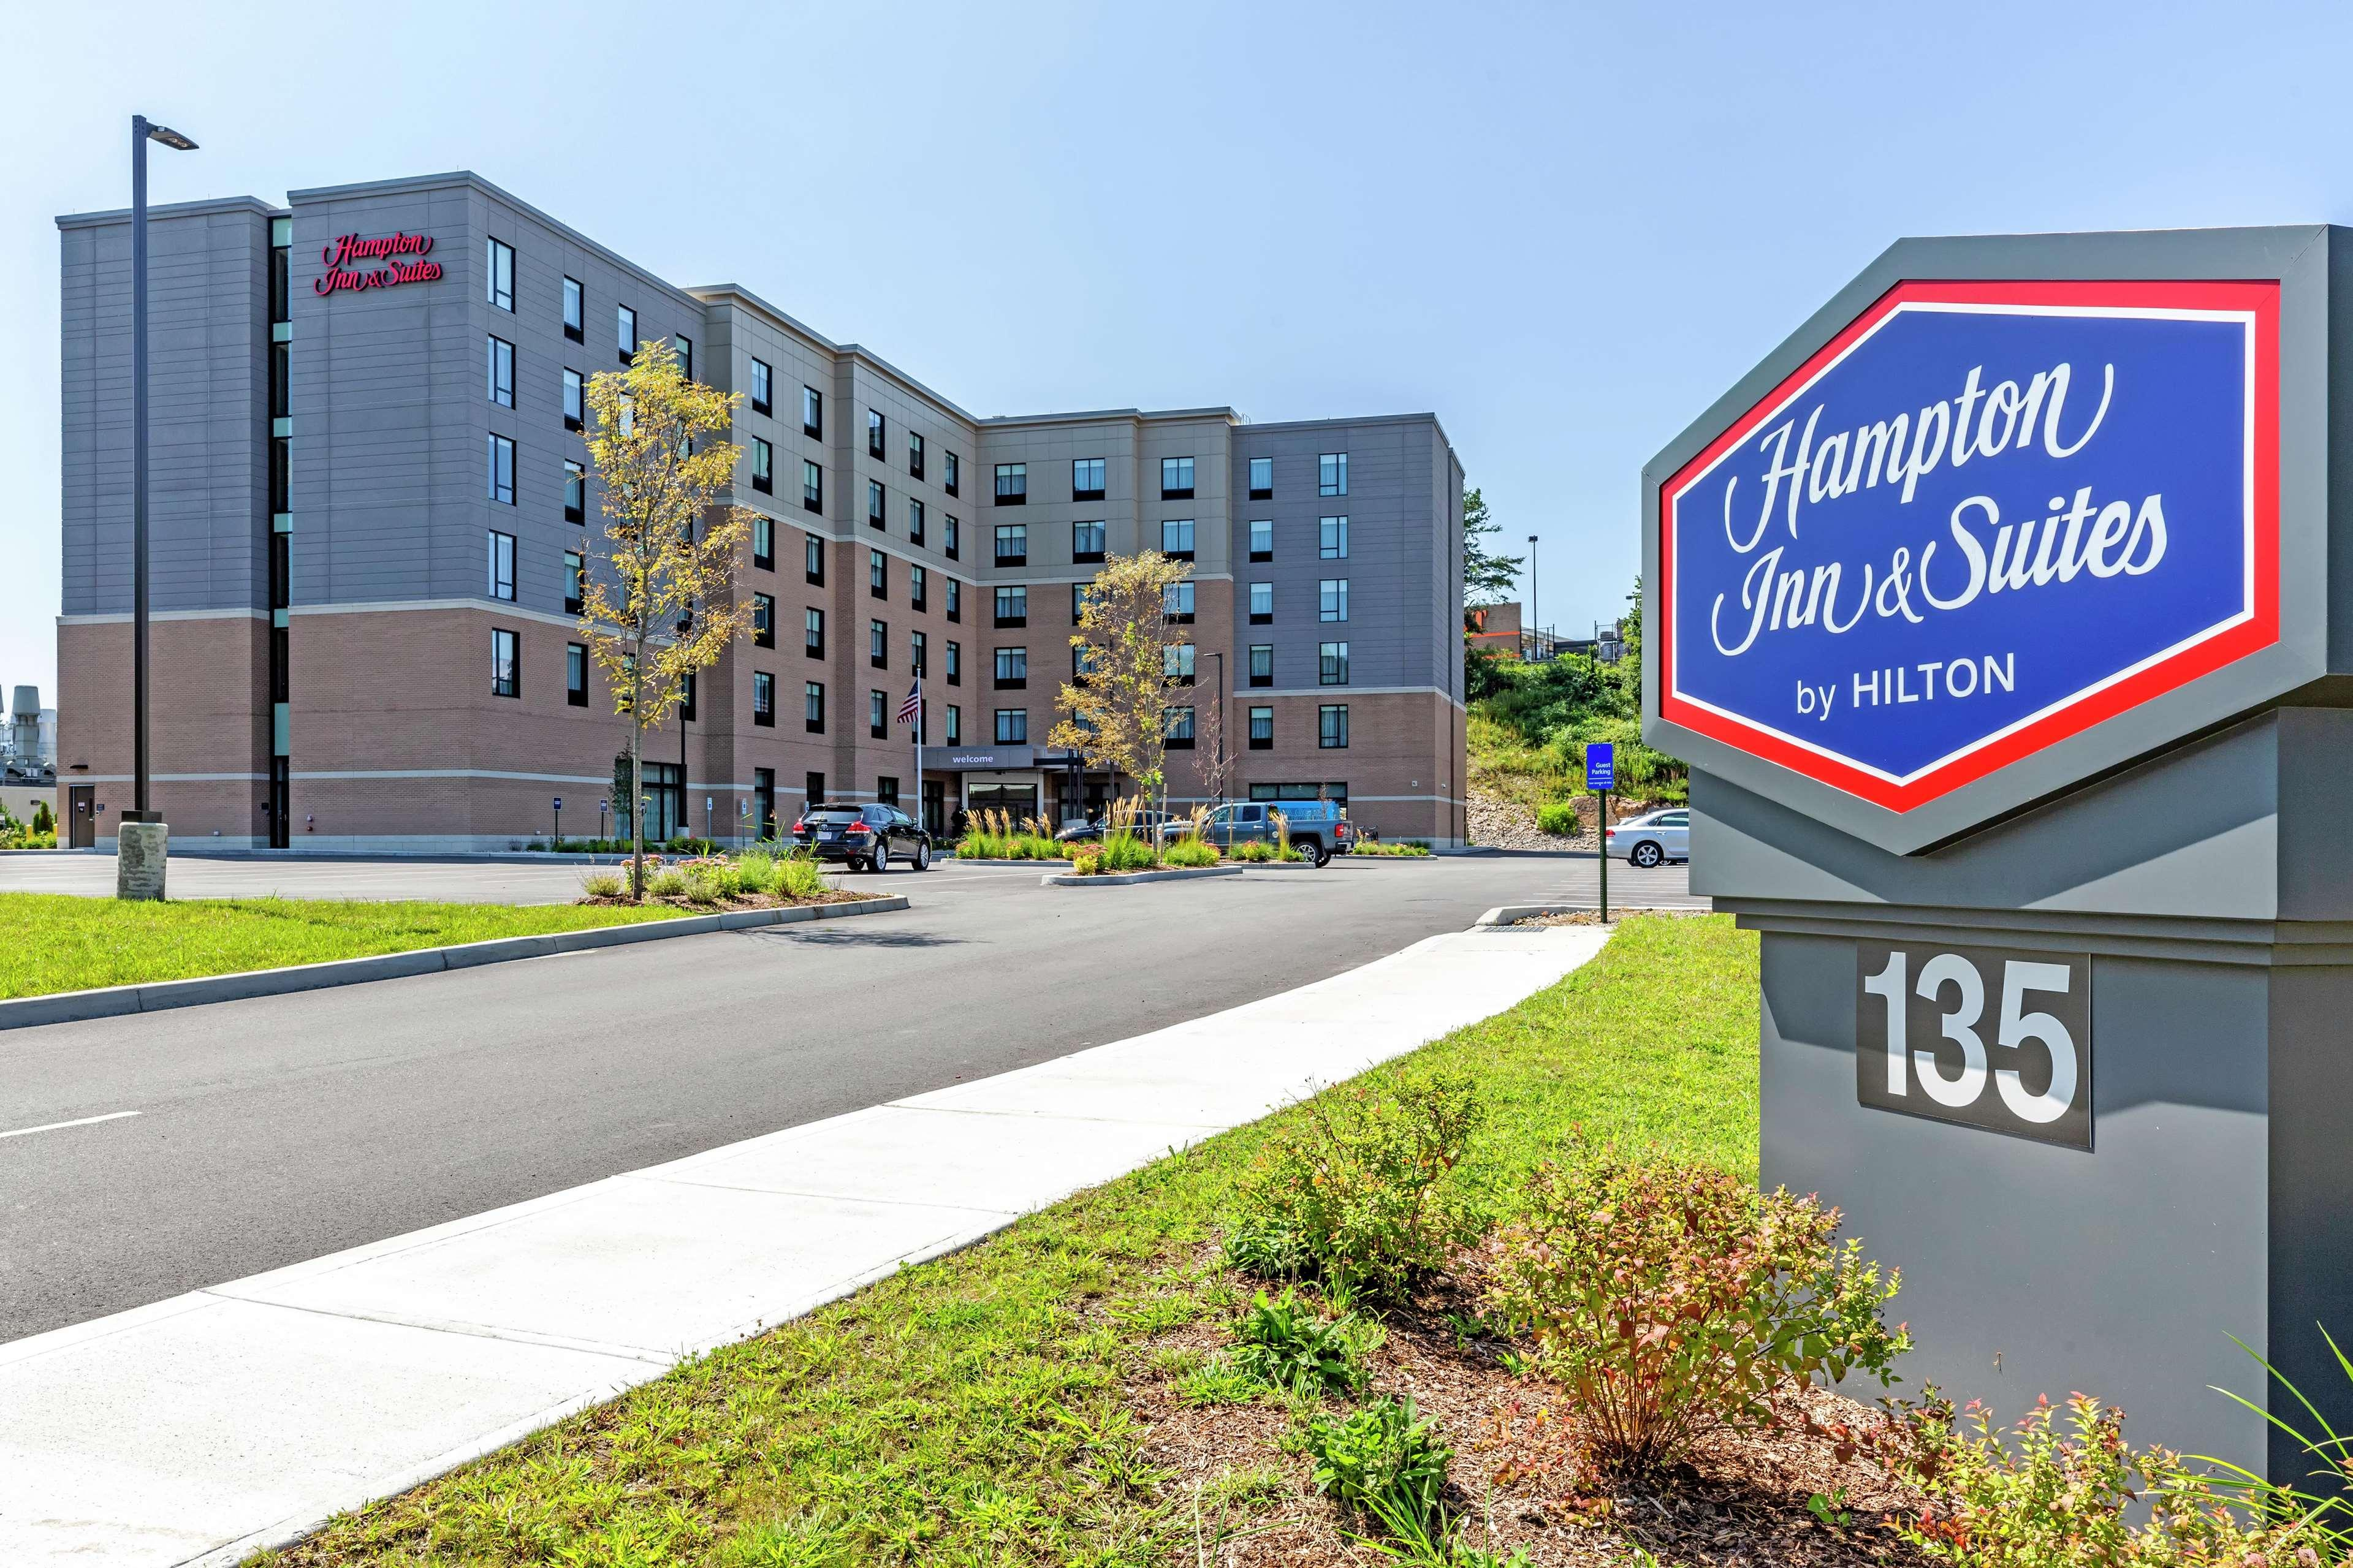 Hampton Inn & Suites Boston/Waltham, MA, Middlesex